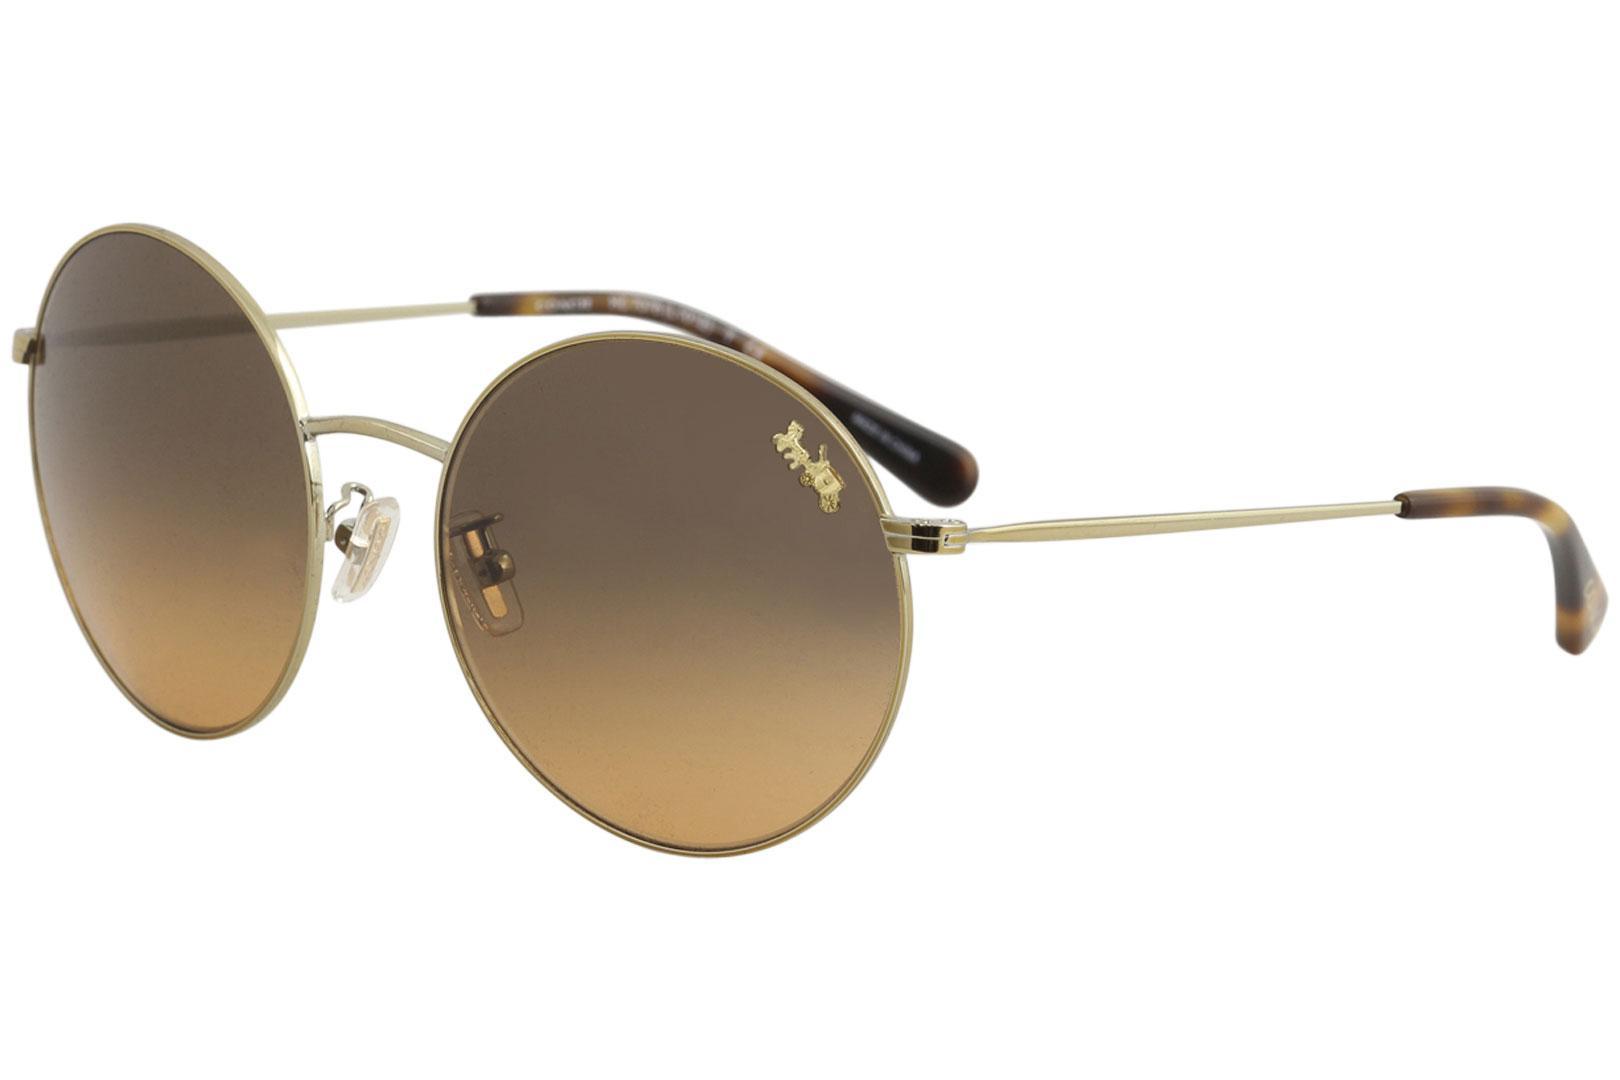 b85e66d60bf4 ... australia coach womens l1012 hc7078 hc 7078 fashion round sunglasses by  coach 1ace8 8401d